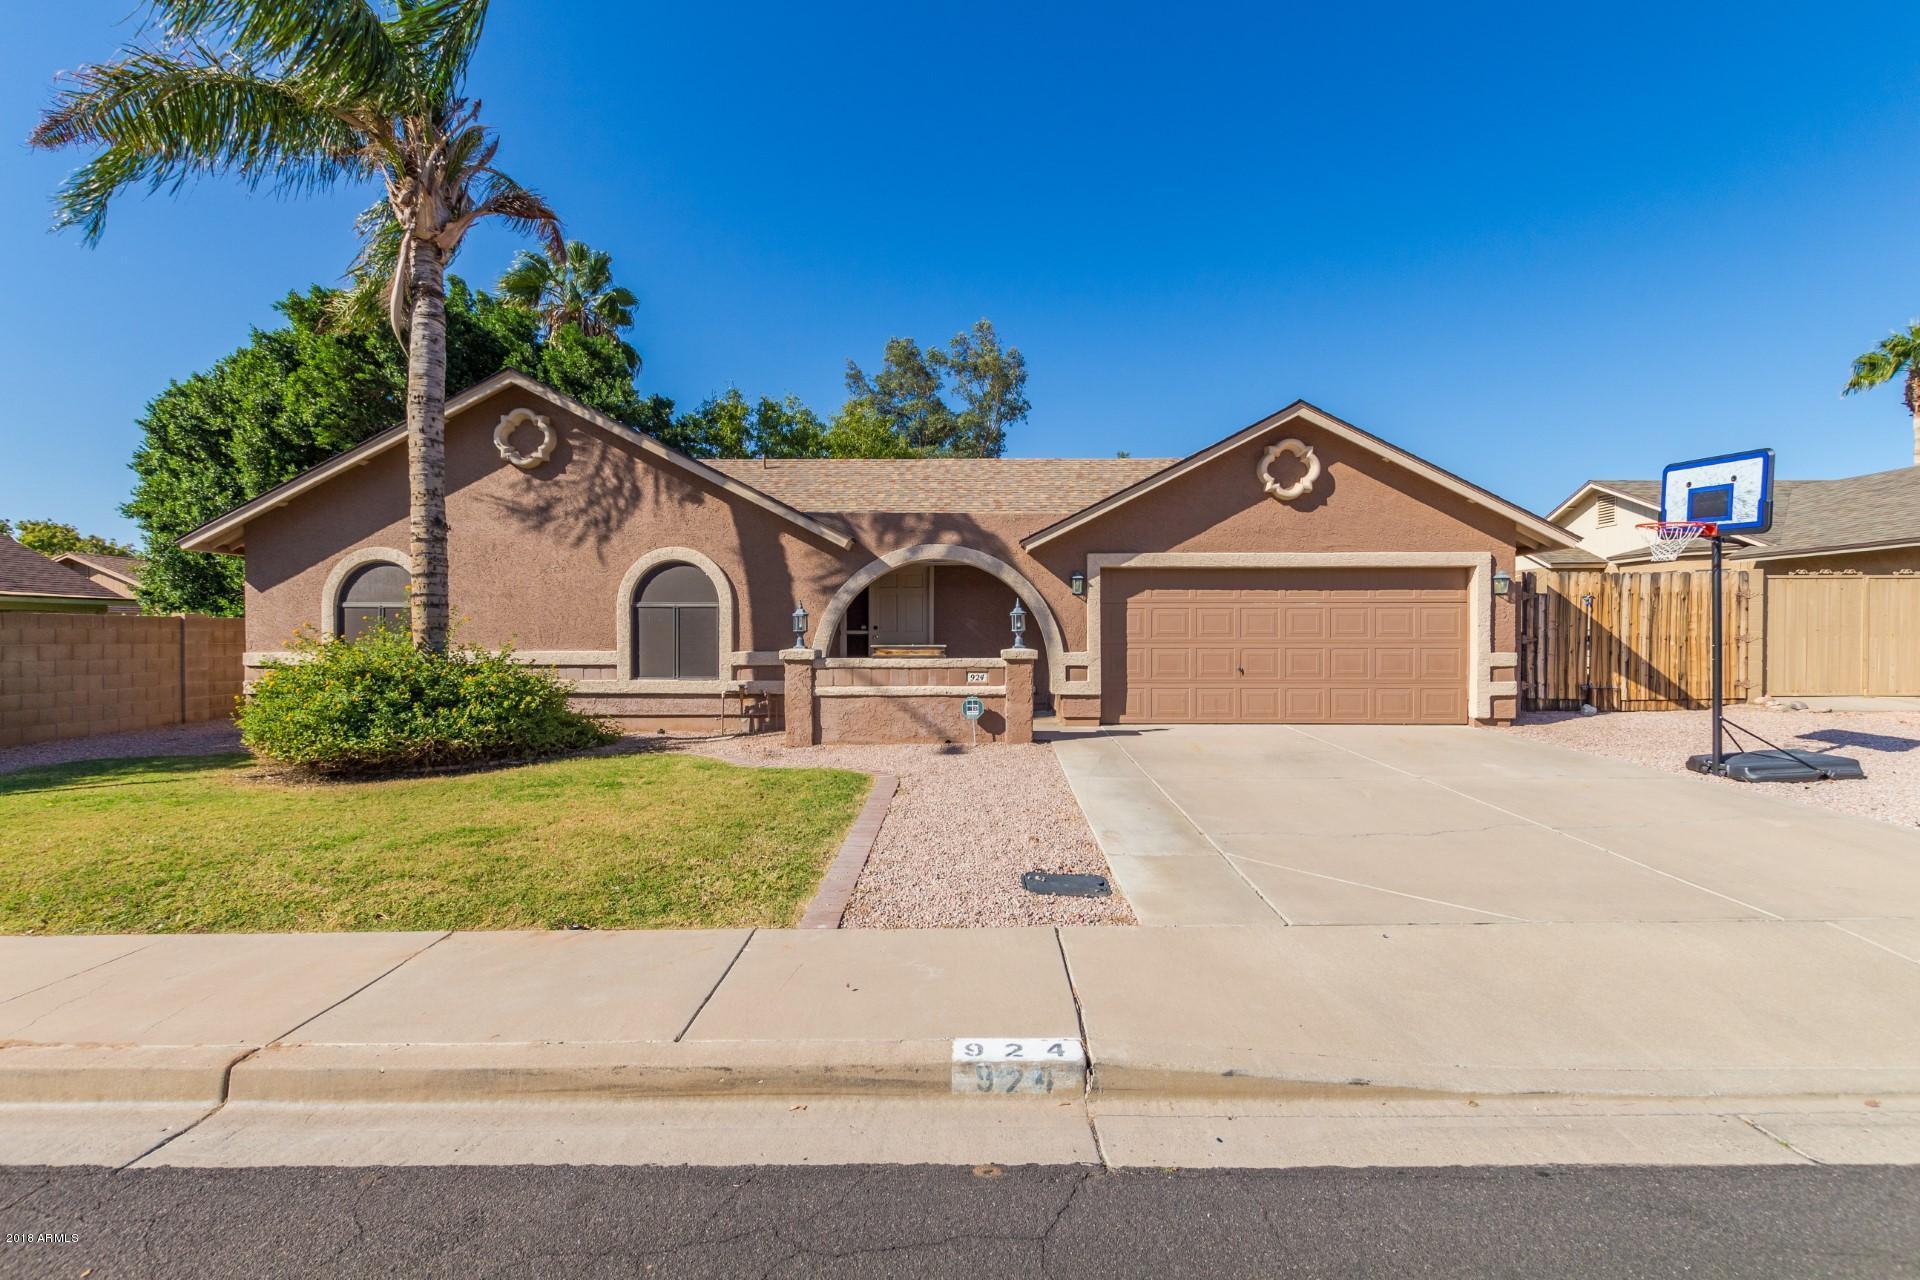 Photo of 924 N 58TH Street, Mesa, AZ 85205